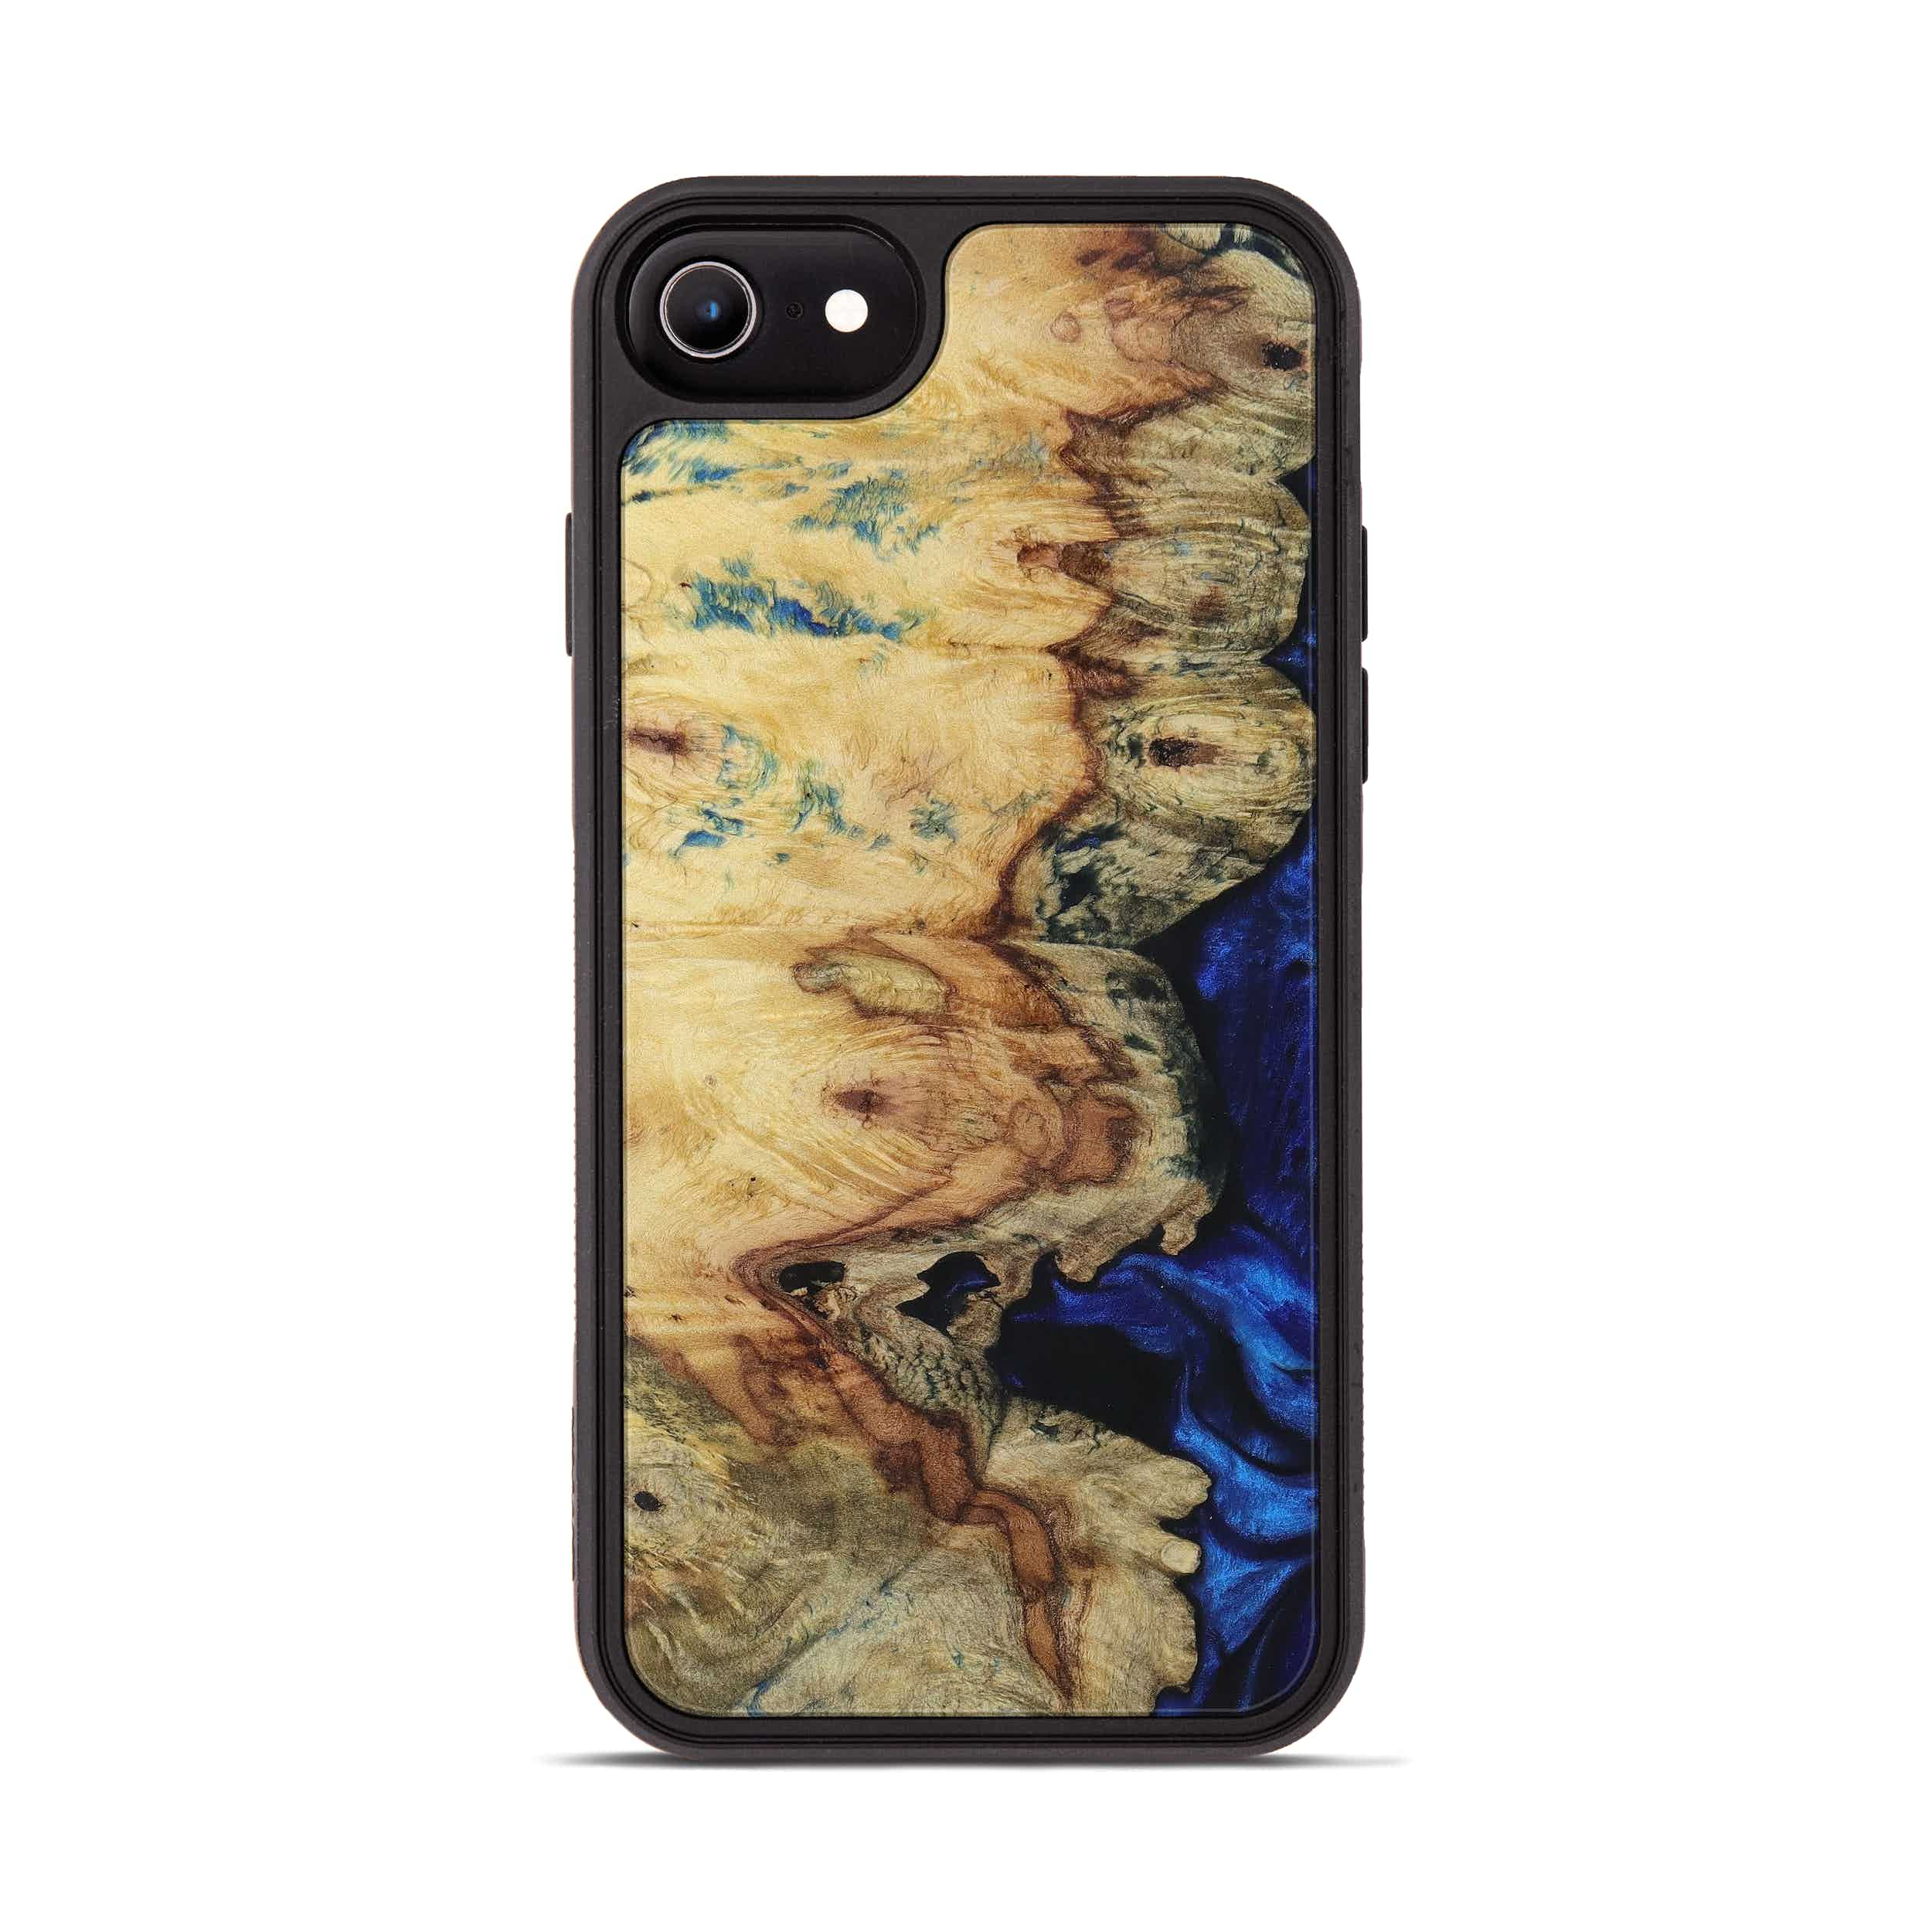 iPhone 7 Wood+Resin Phone Case - Ruchi (Dark Blue, 399846)